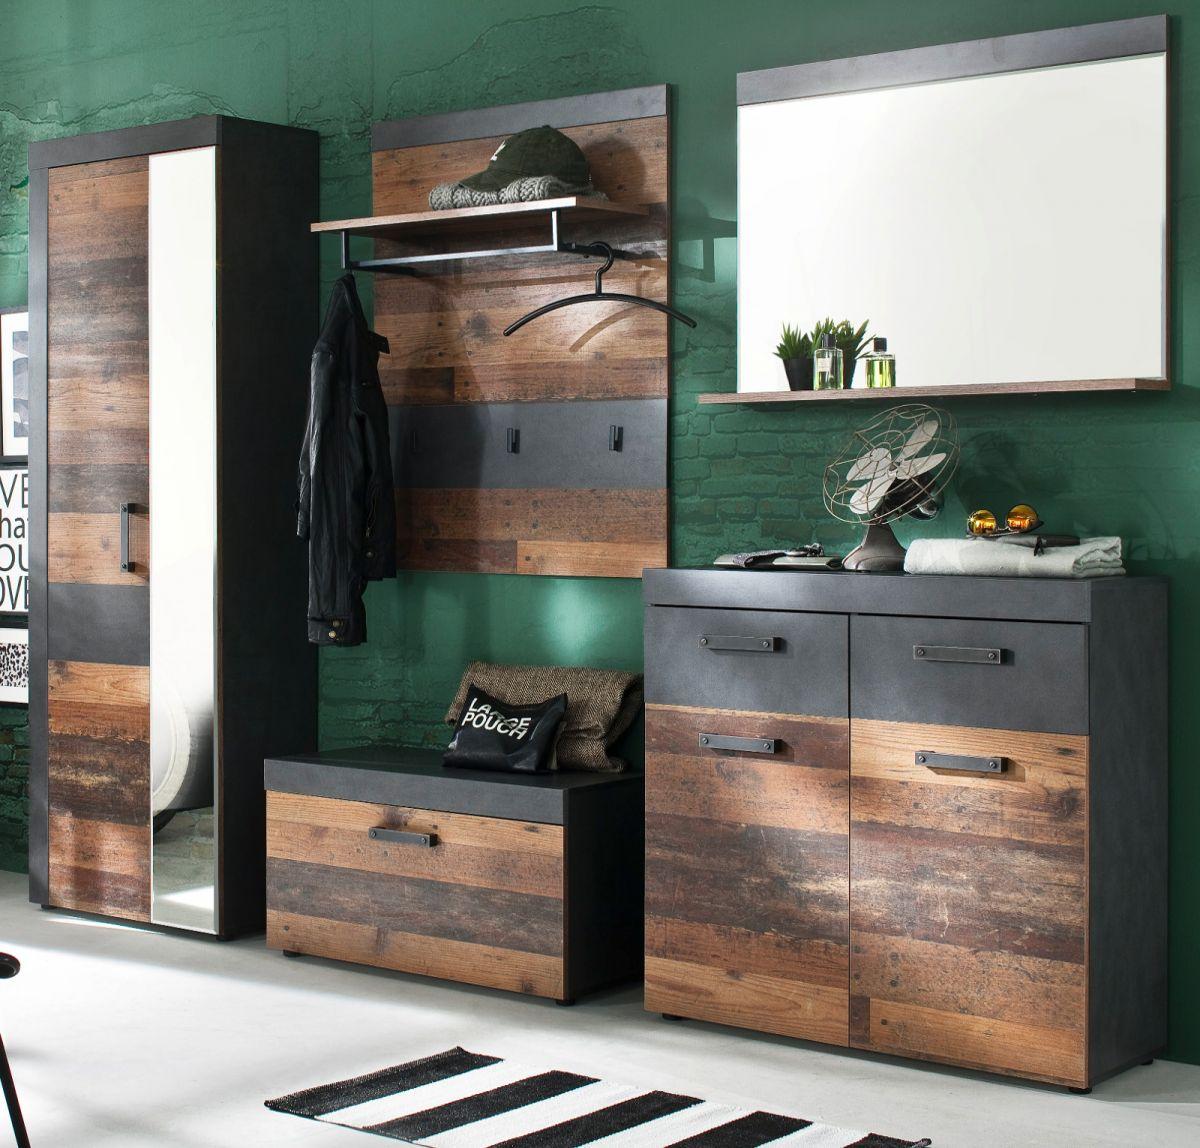 Garderobenset Indy 5-teilig Used Wood und Matera grau 265 cm